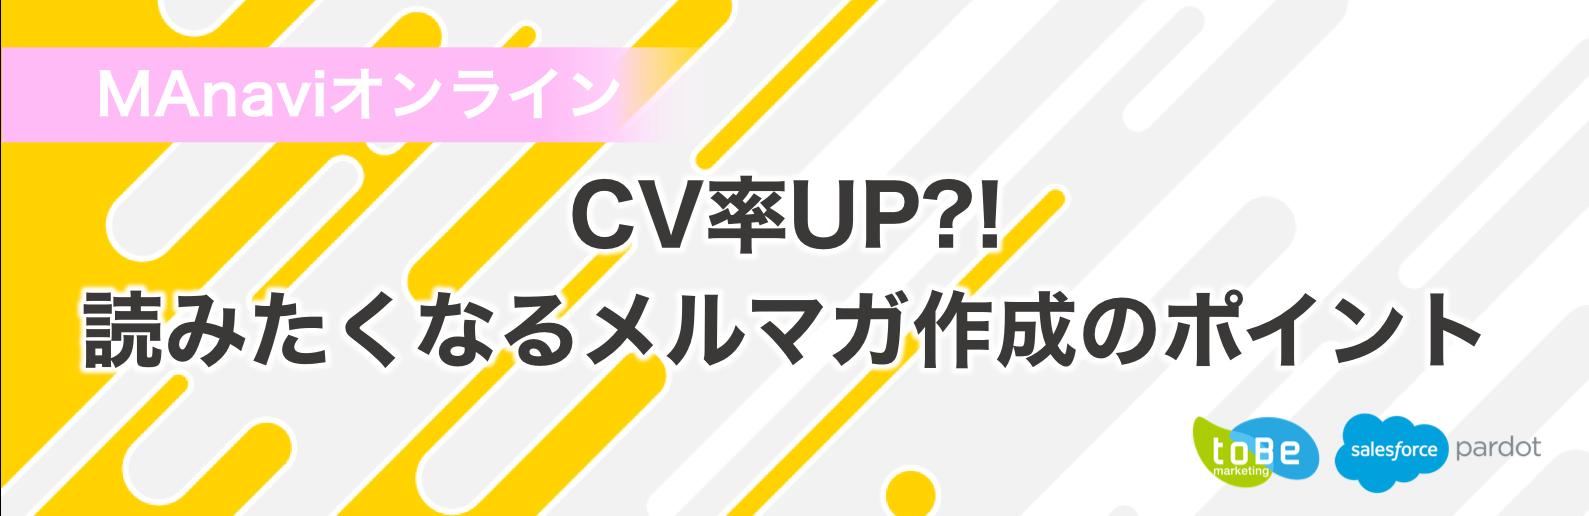 【MAnaviオンライン】CV率UP?! 読みたくなるメルマガ作成のポイント